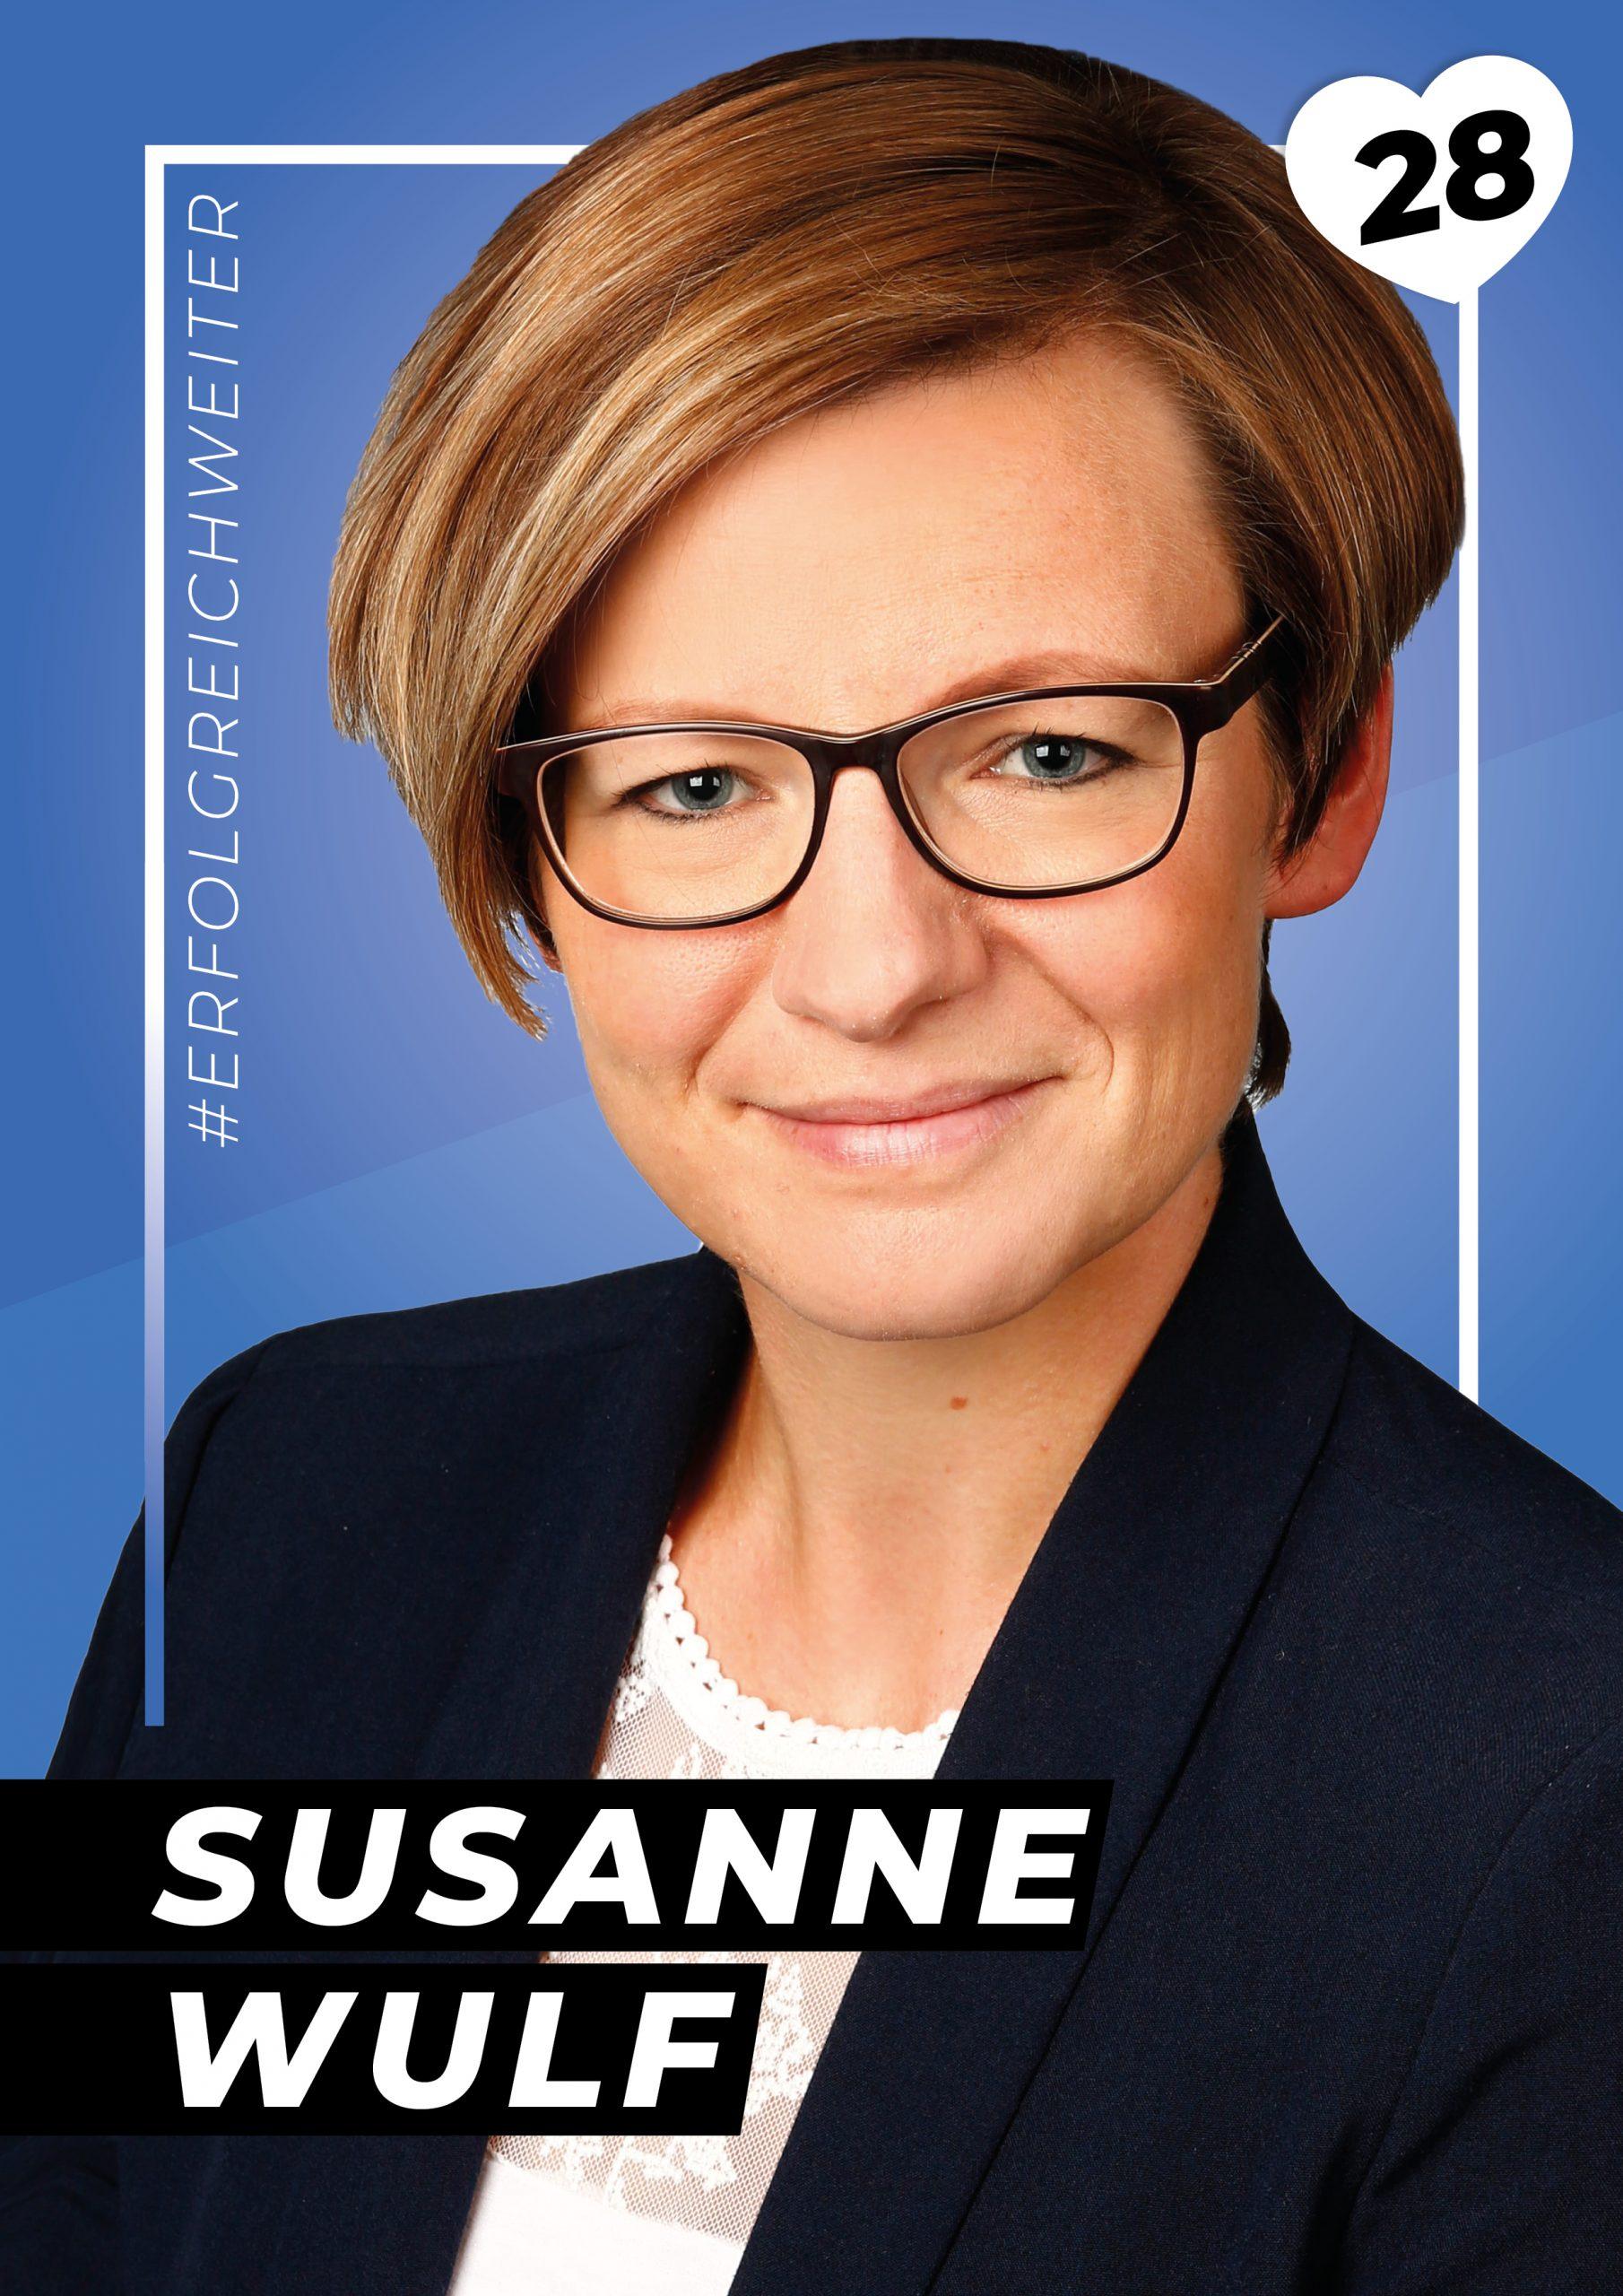 2019 Bürgerliste Köfering_Kandidaten28